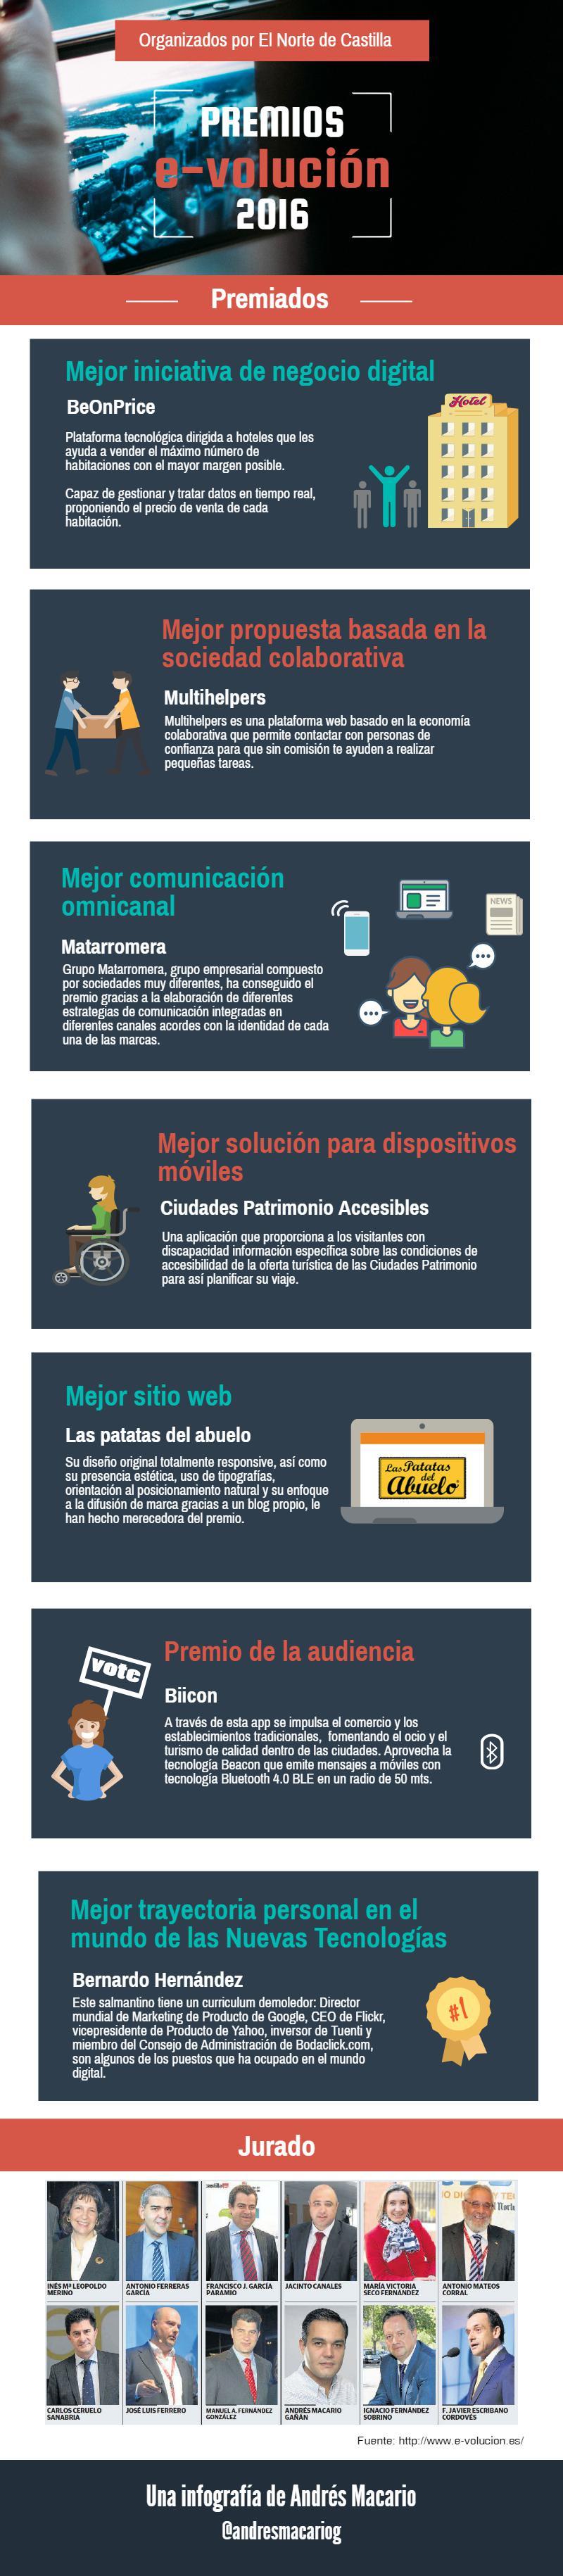 Premios evolucion Infografia Andres Macario